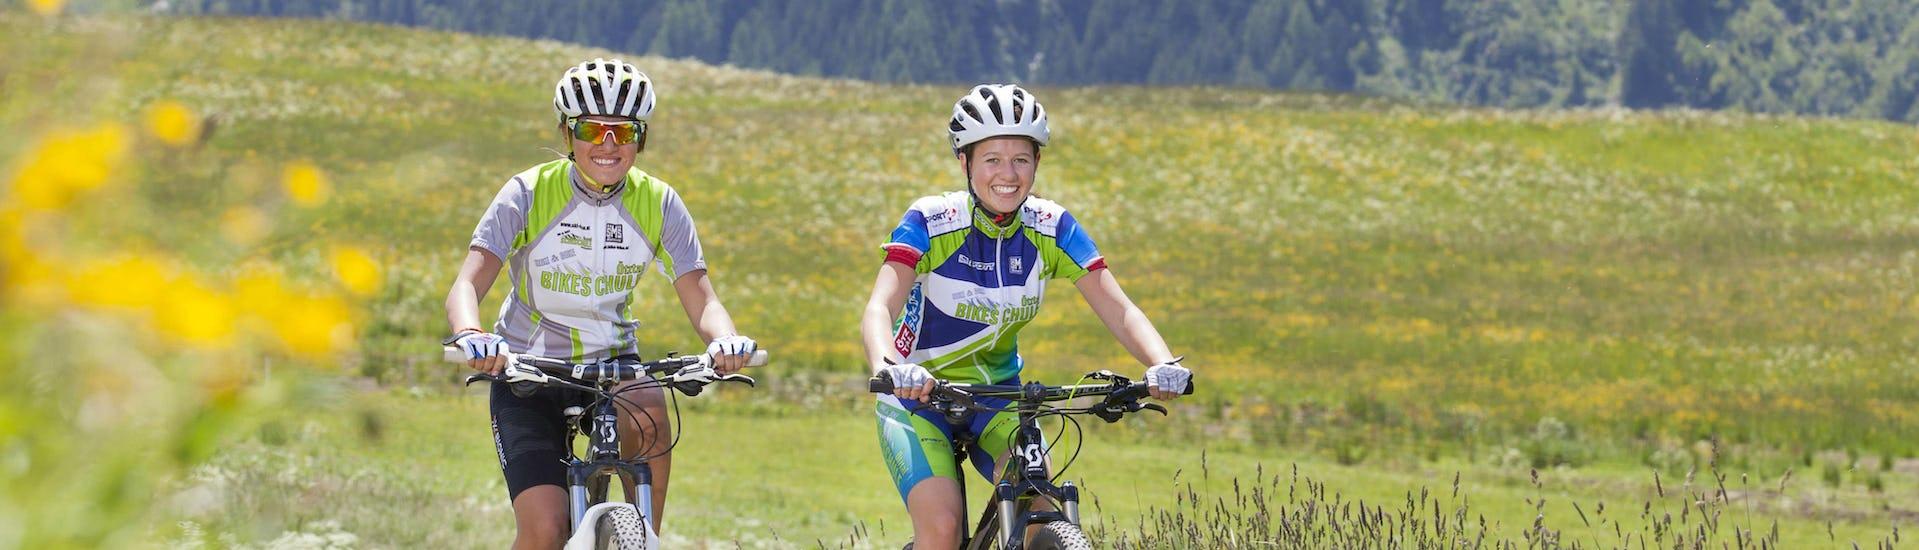 Mountain Bike Tours in Sölden - Advanced